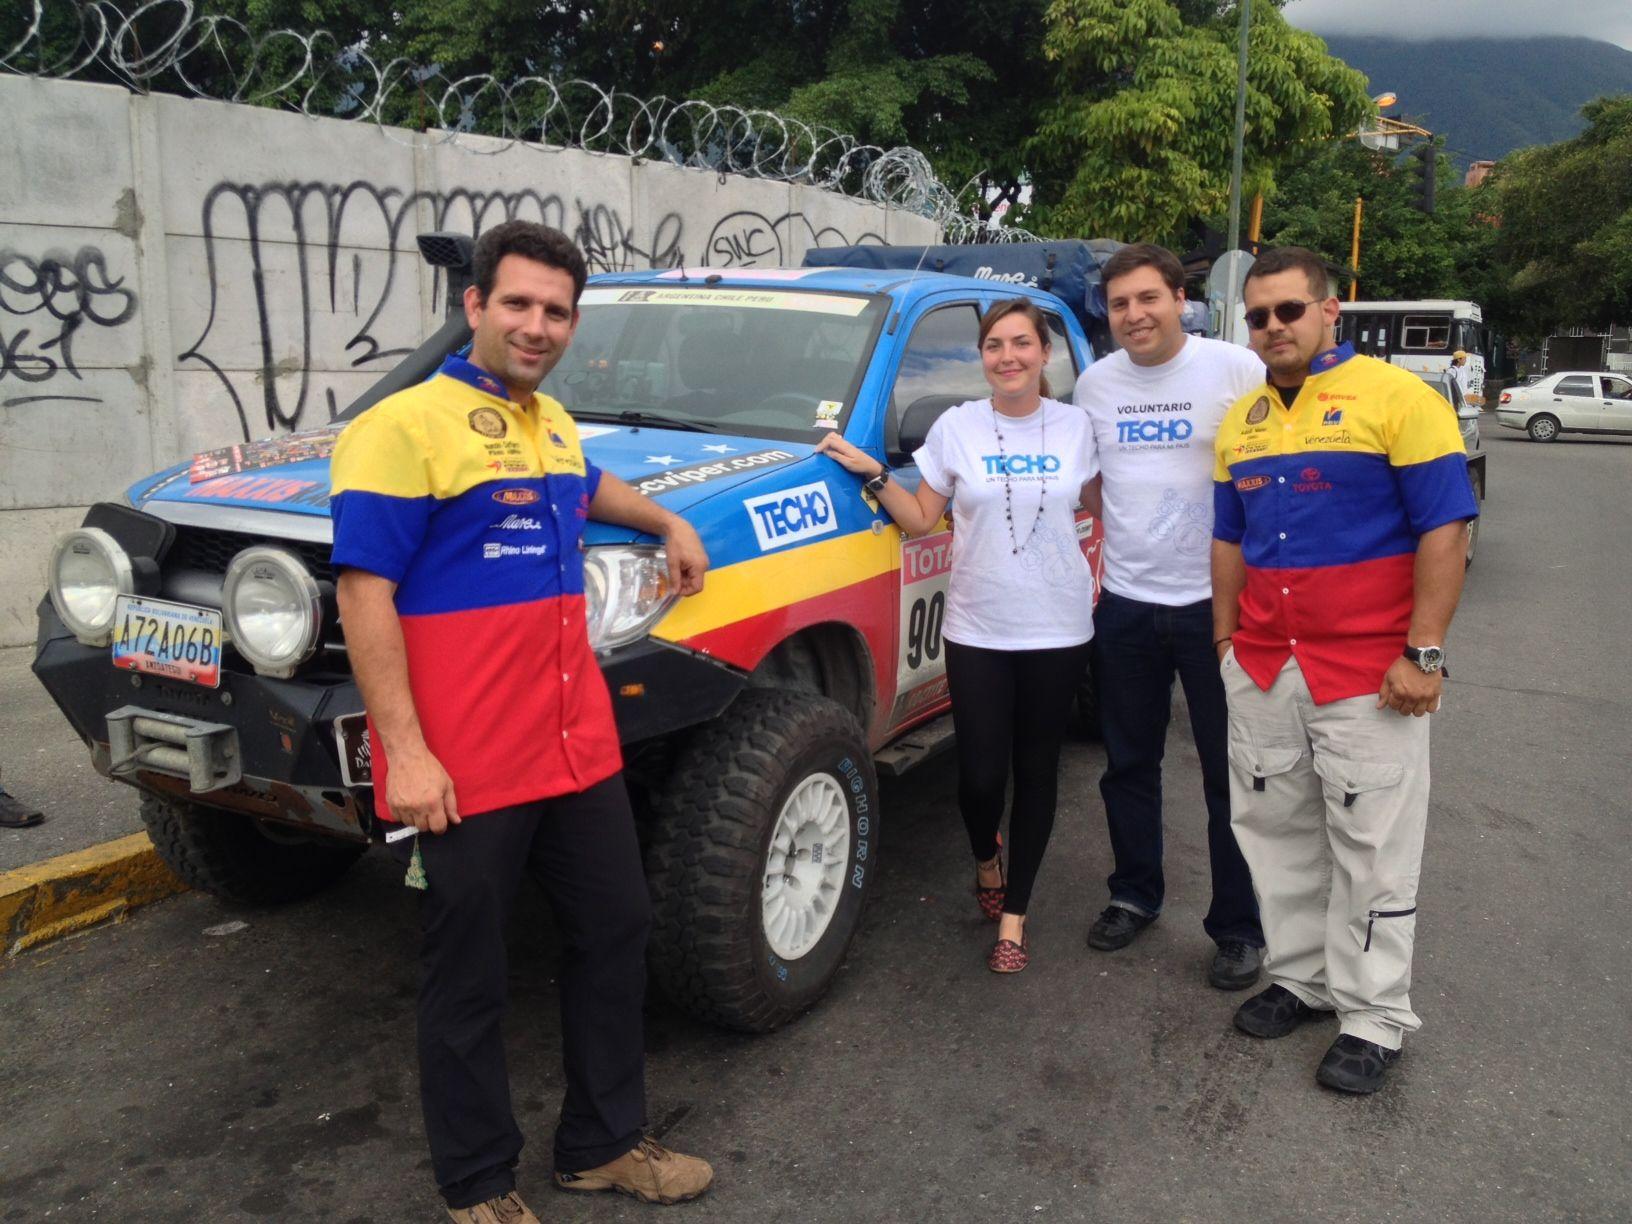 #venezuela #dakar2013 #techo #ngo #rally #nomorepoverty #youth #collaborate #volunteer